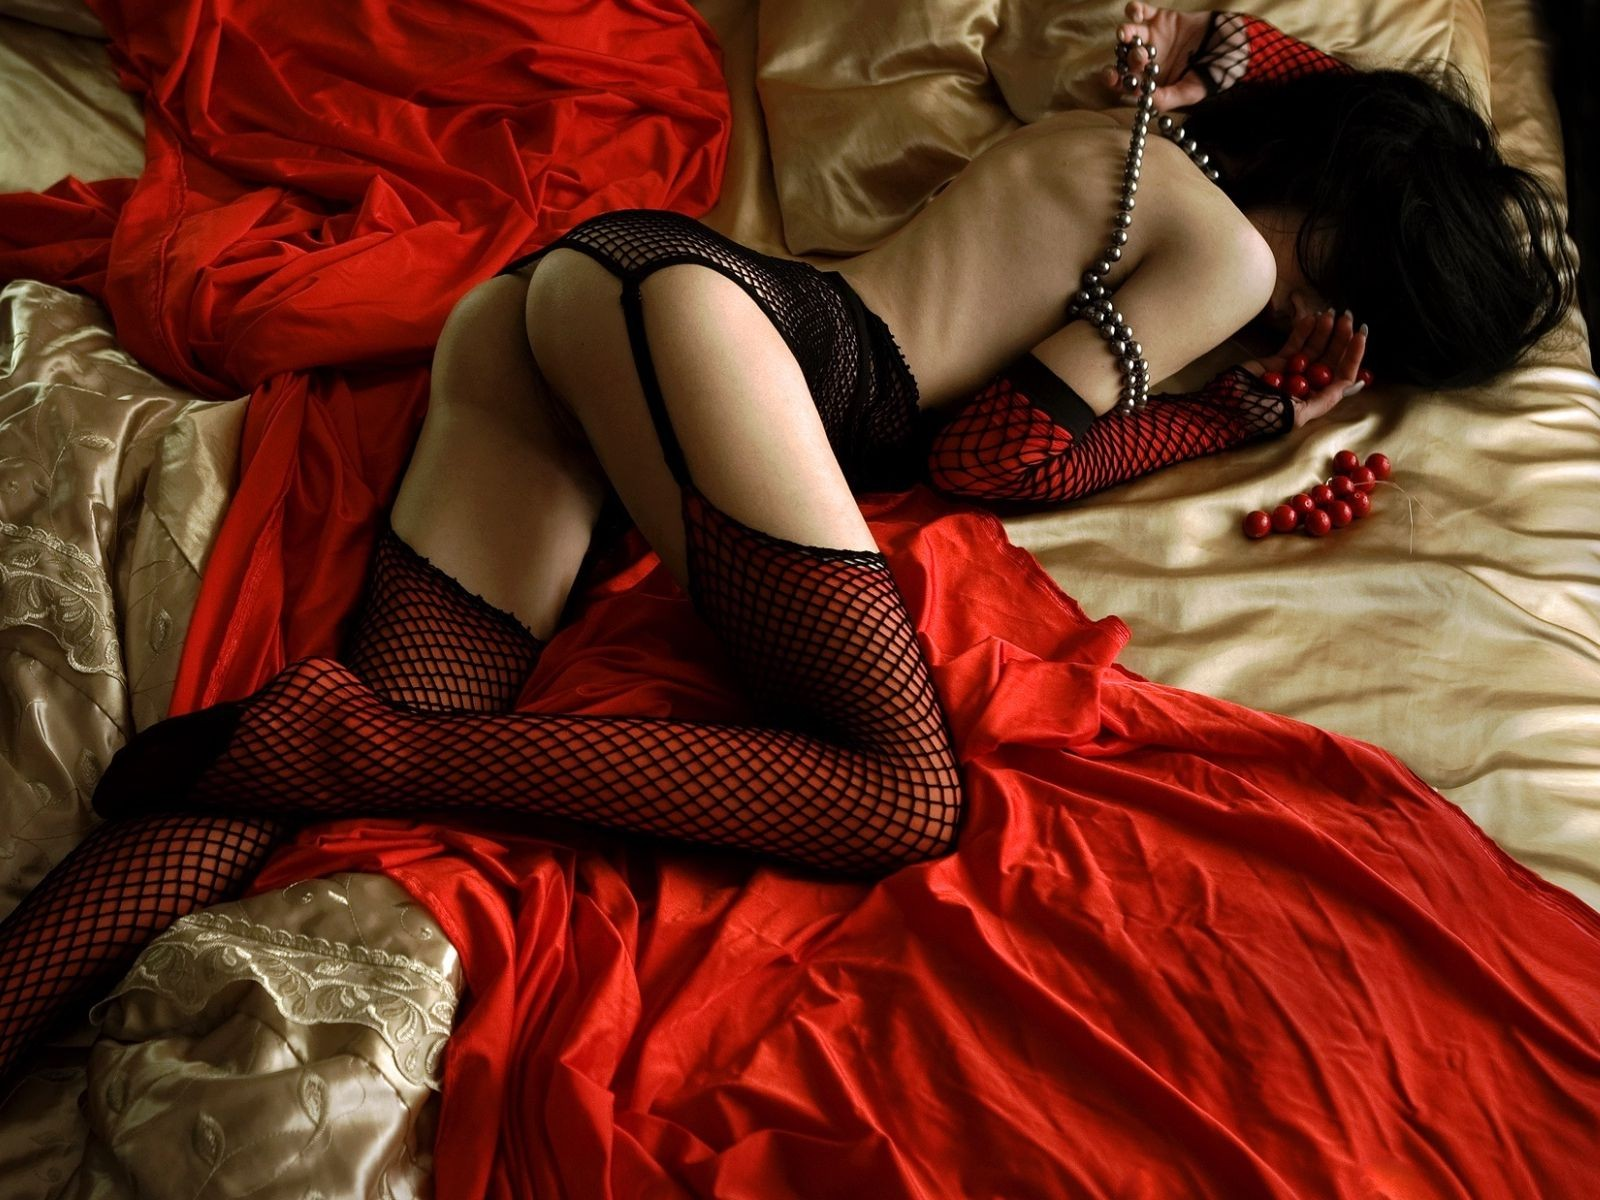 chernoe-i-krasnoe-erotika-video